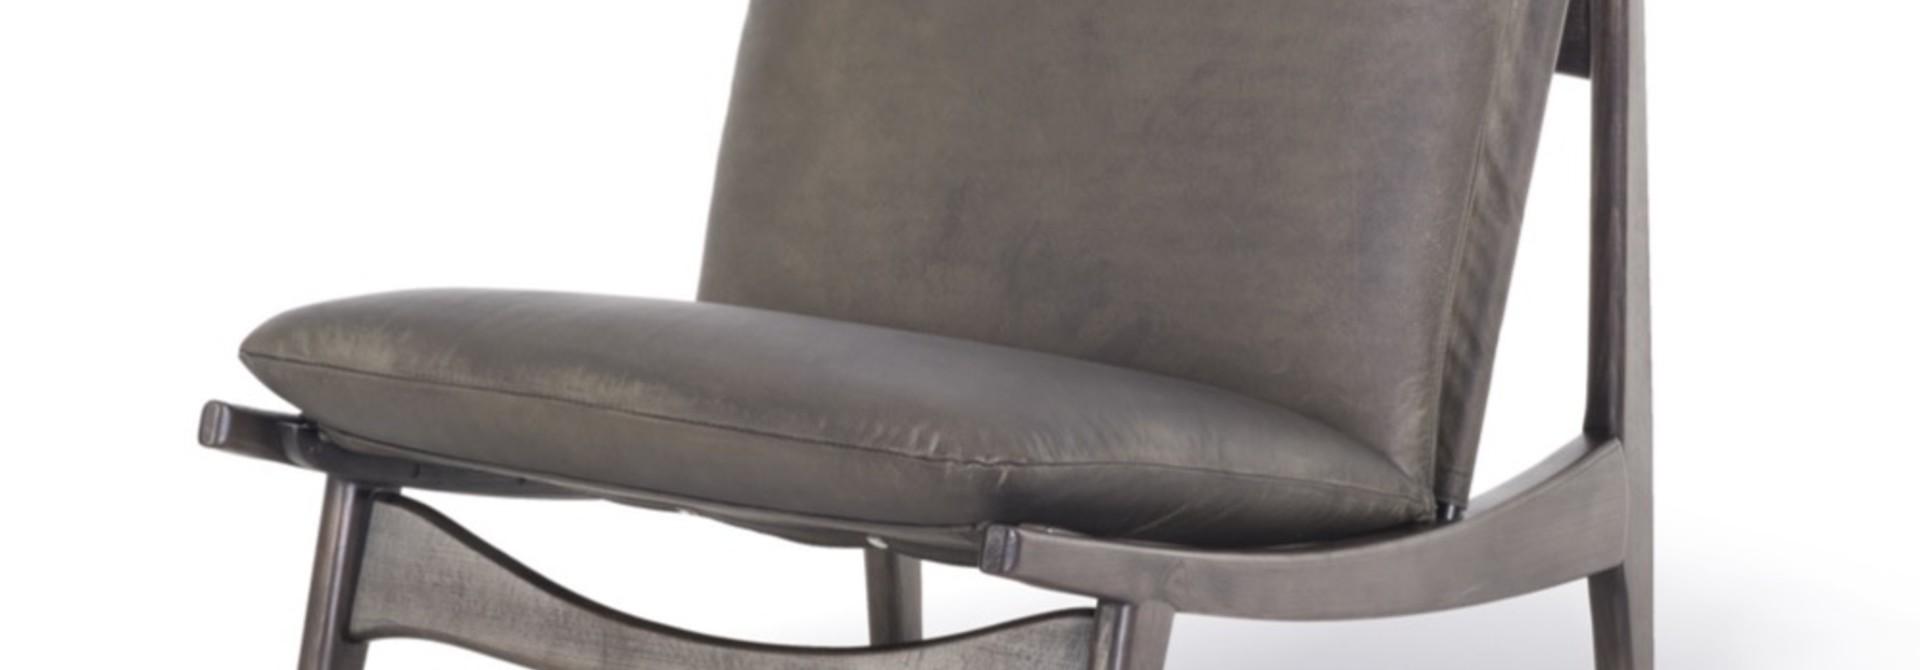 Contemporary Loft fauteuil